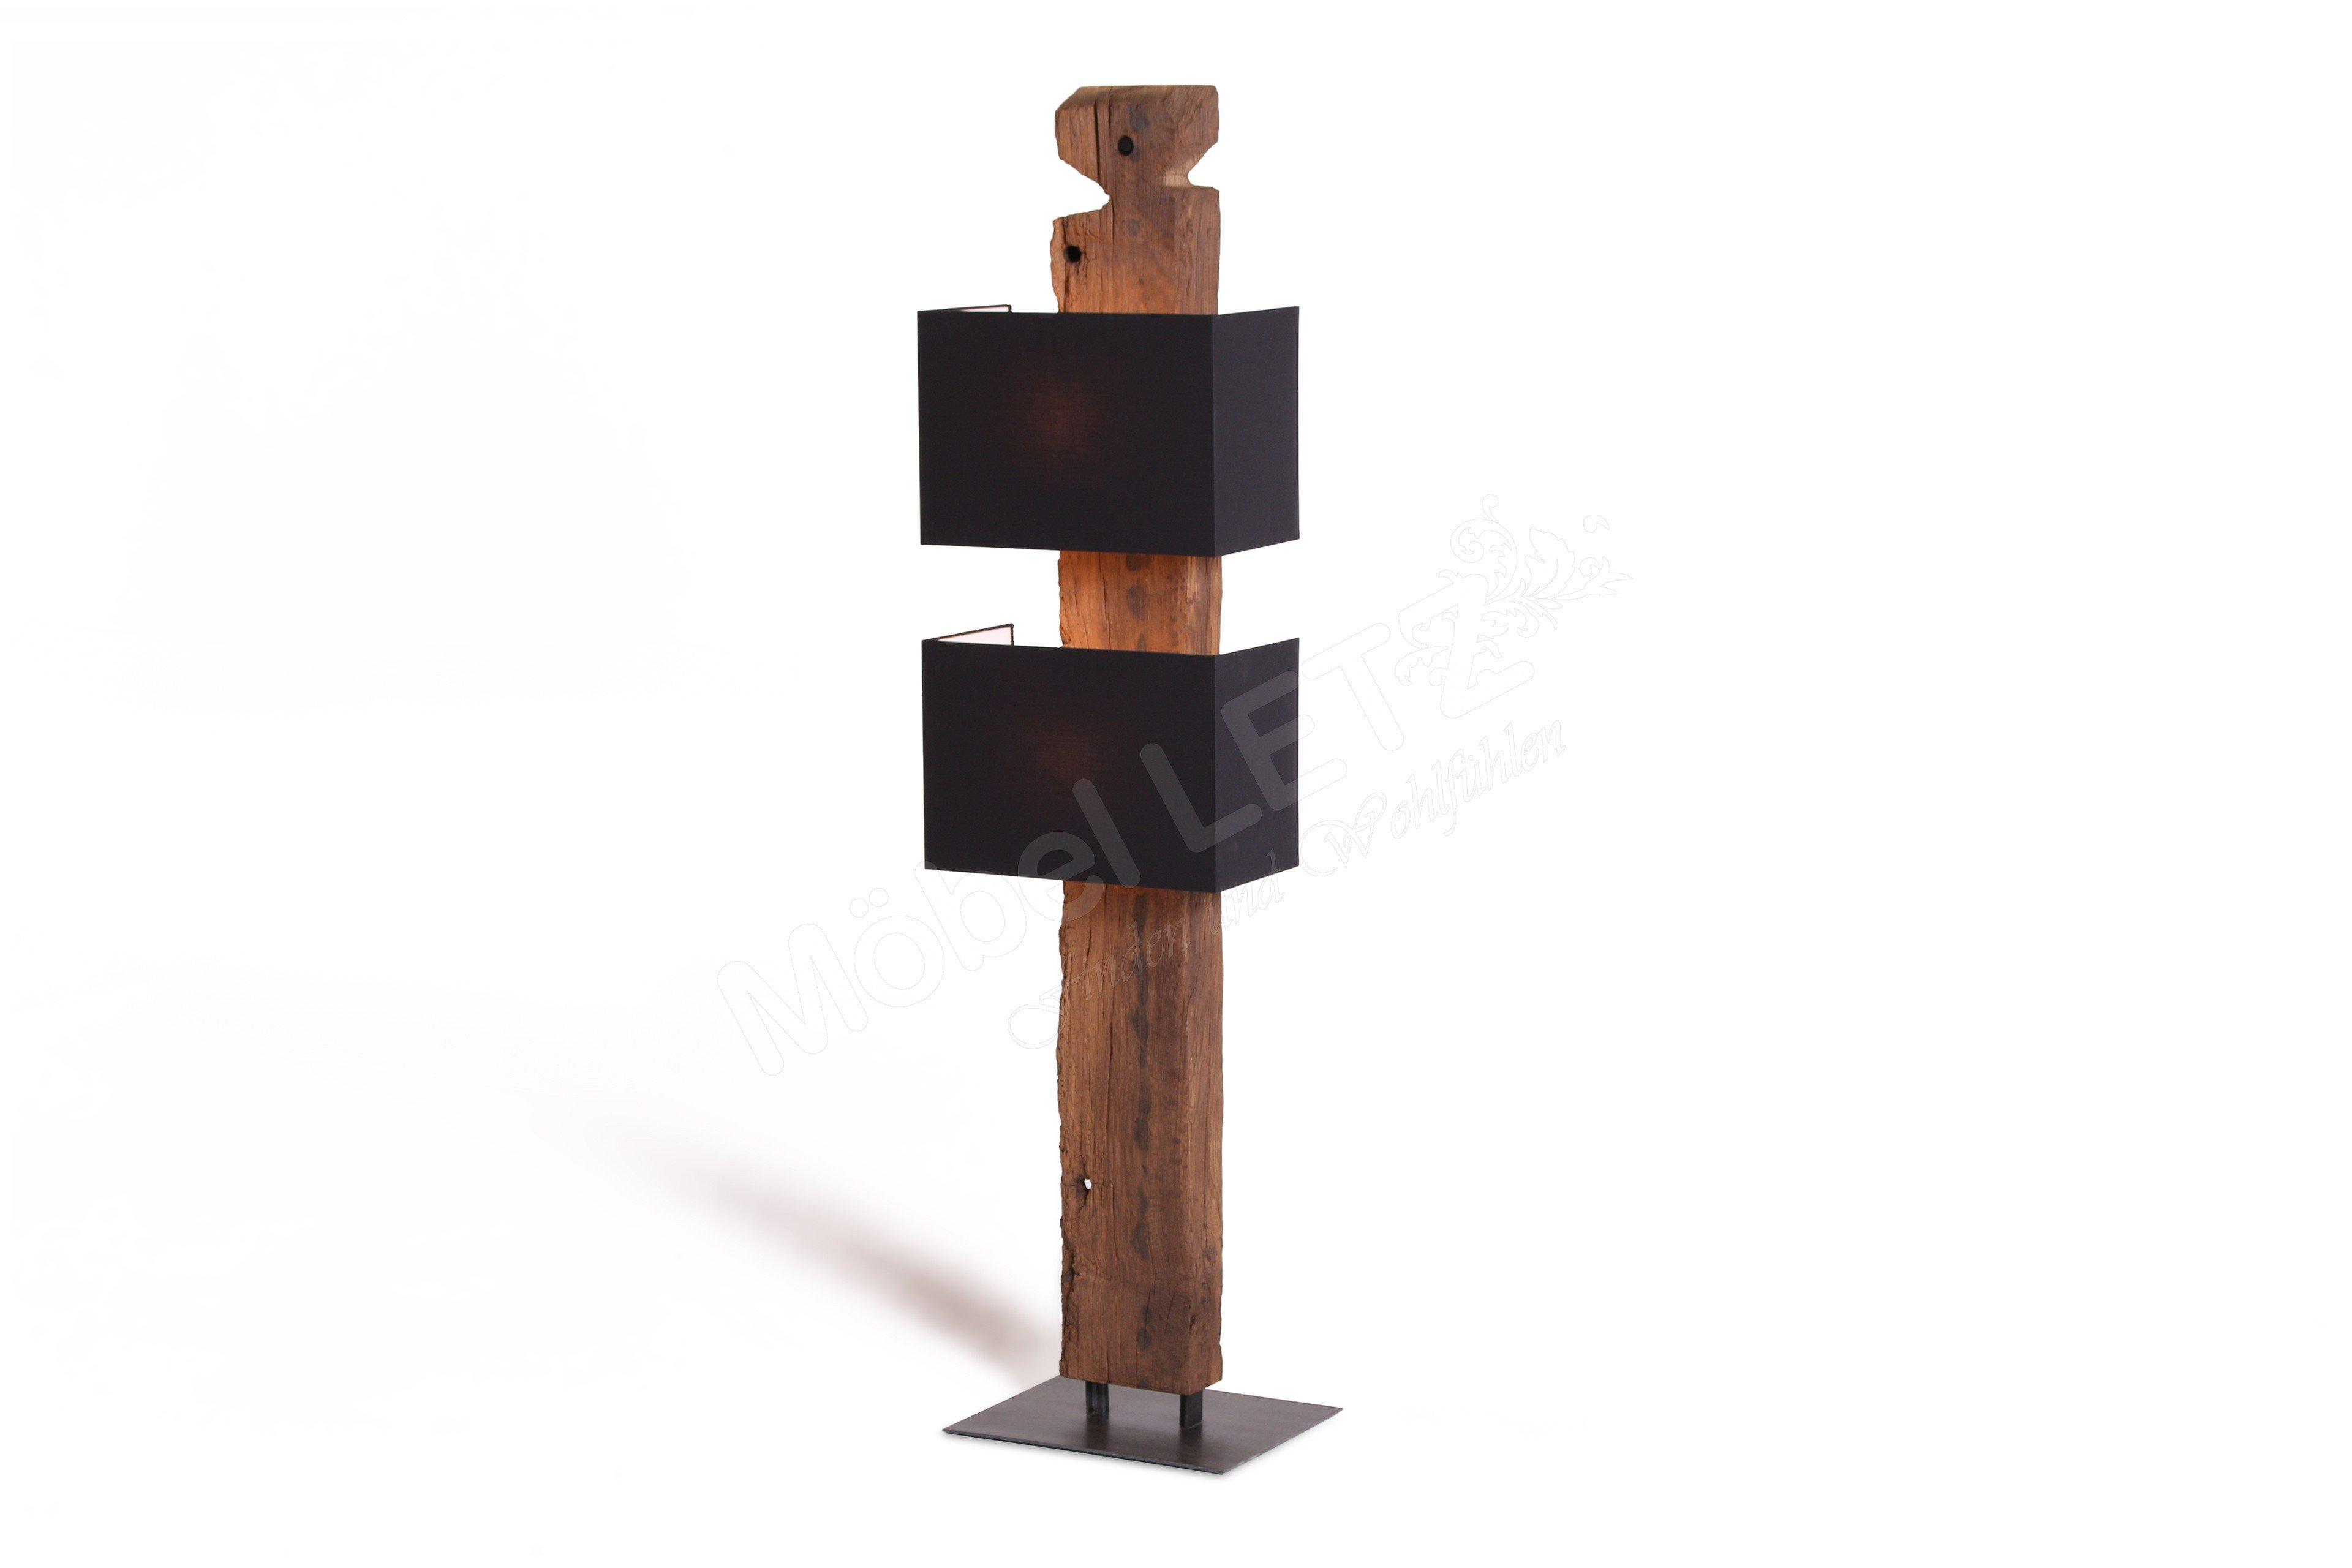 Sprenger Stehlampe Largo 12 35 Holzbalken Mobel Letz Ihr